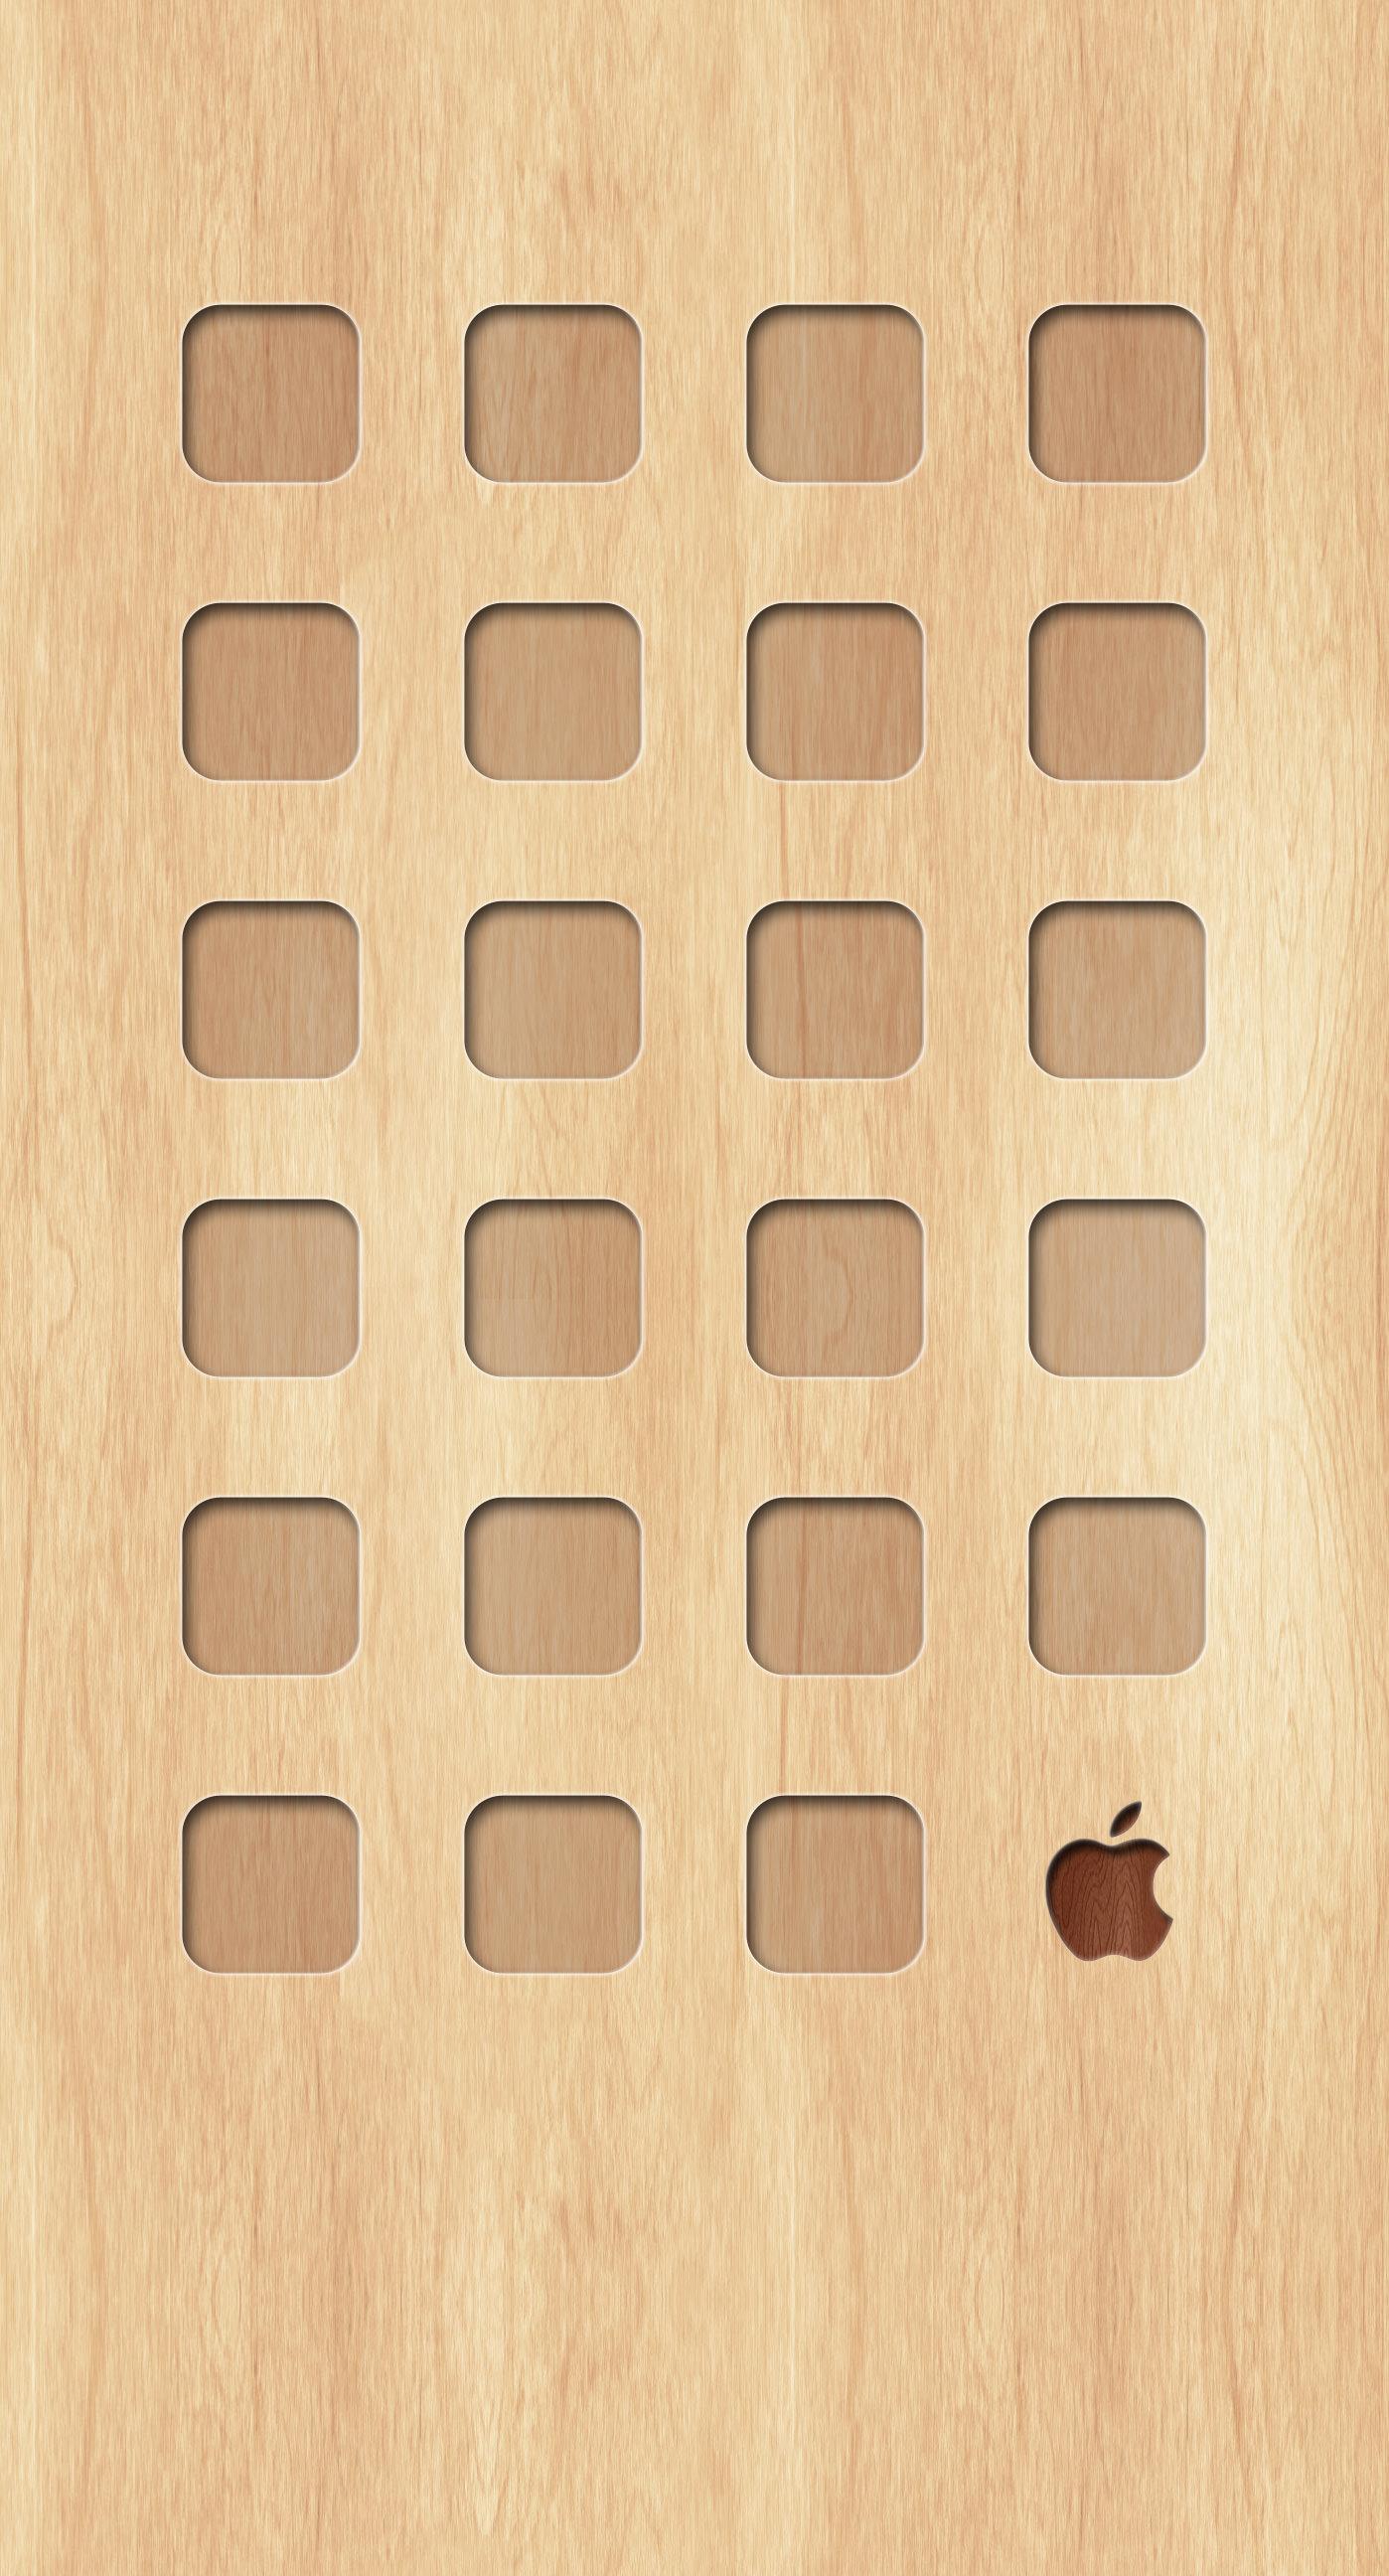 Shelf Wood plate tea yellow Apple logo wallpapersc iPhone7Plus 1398x2592